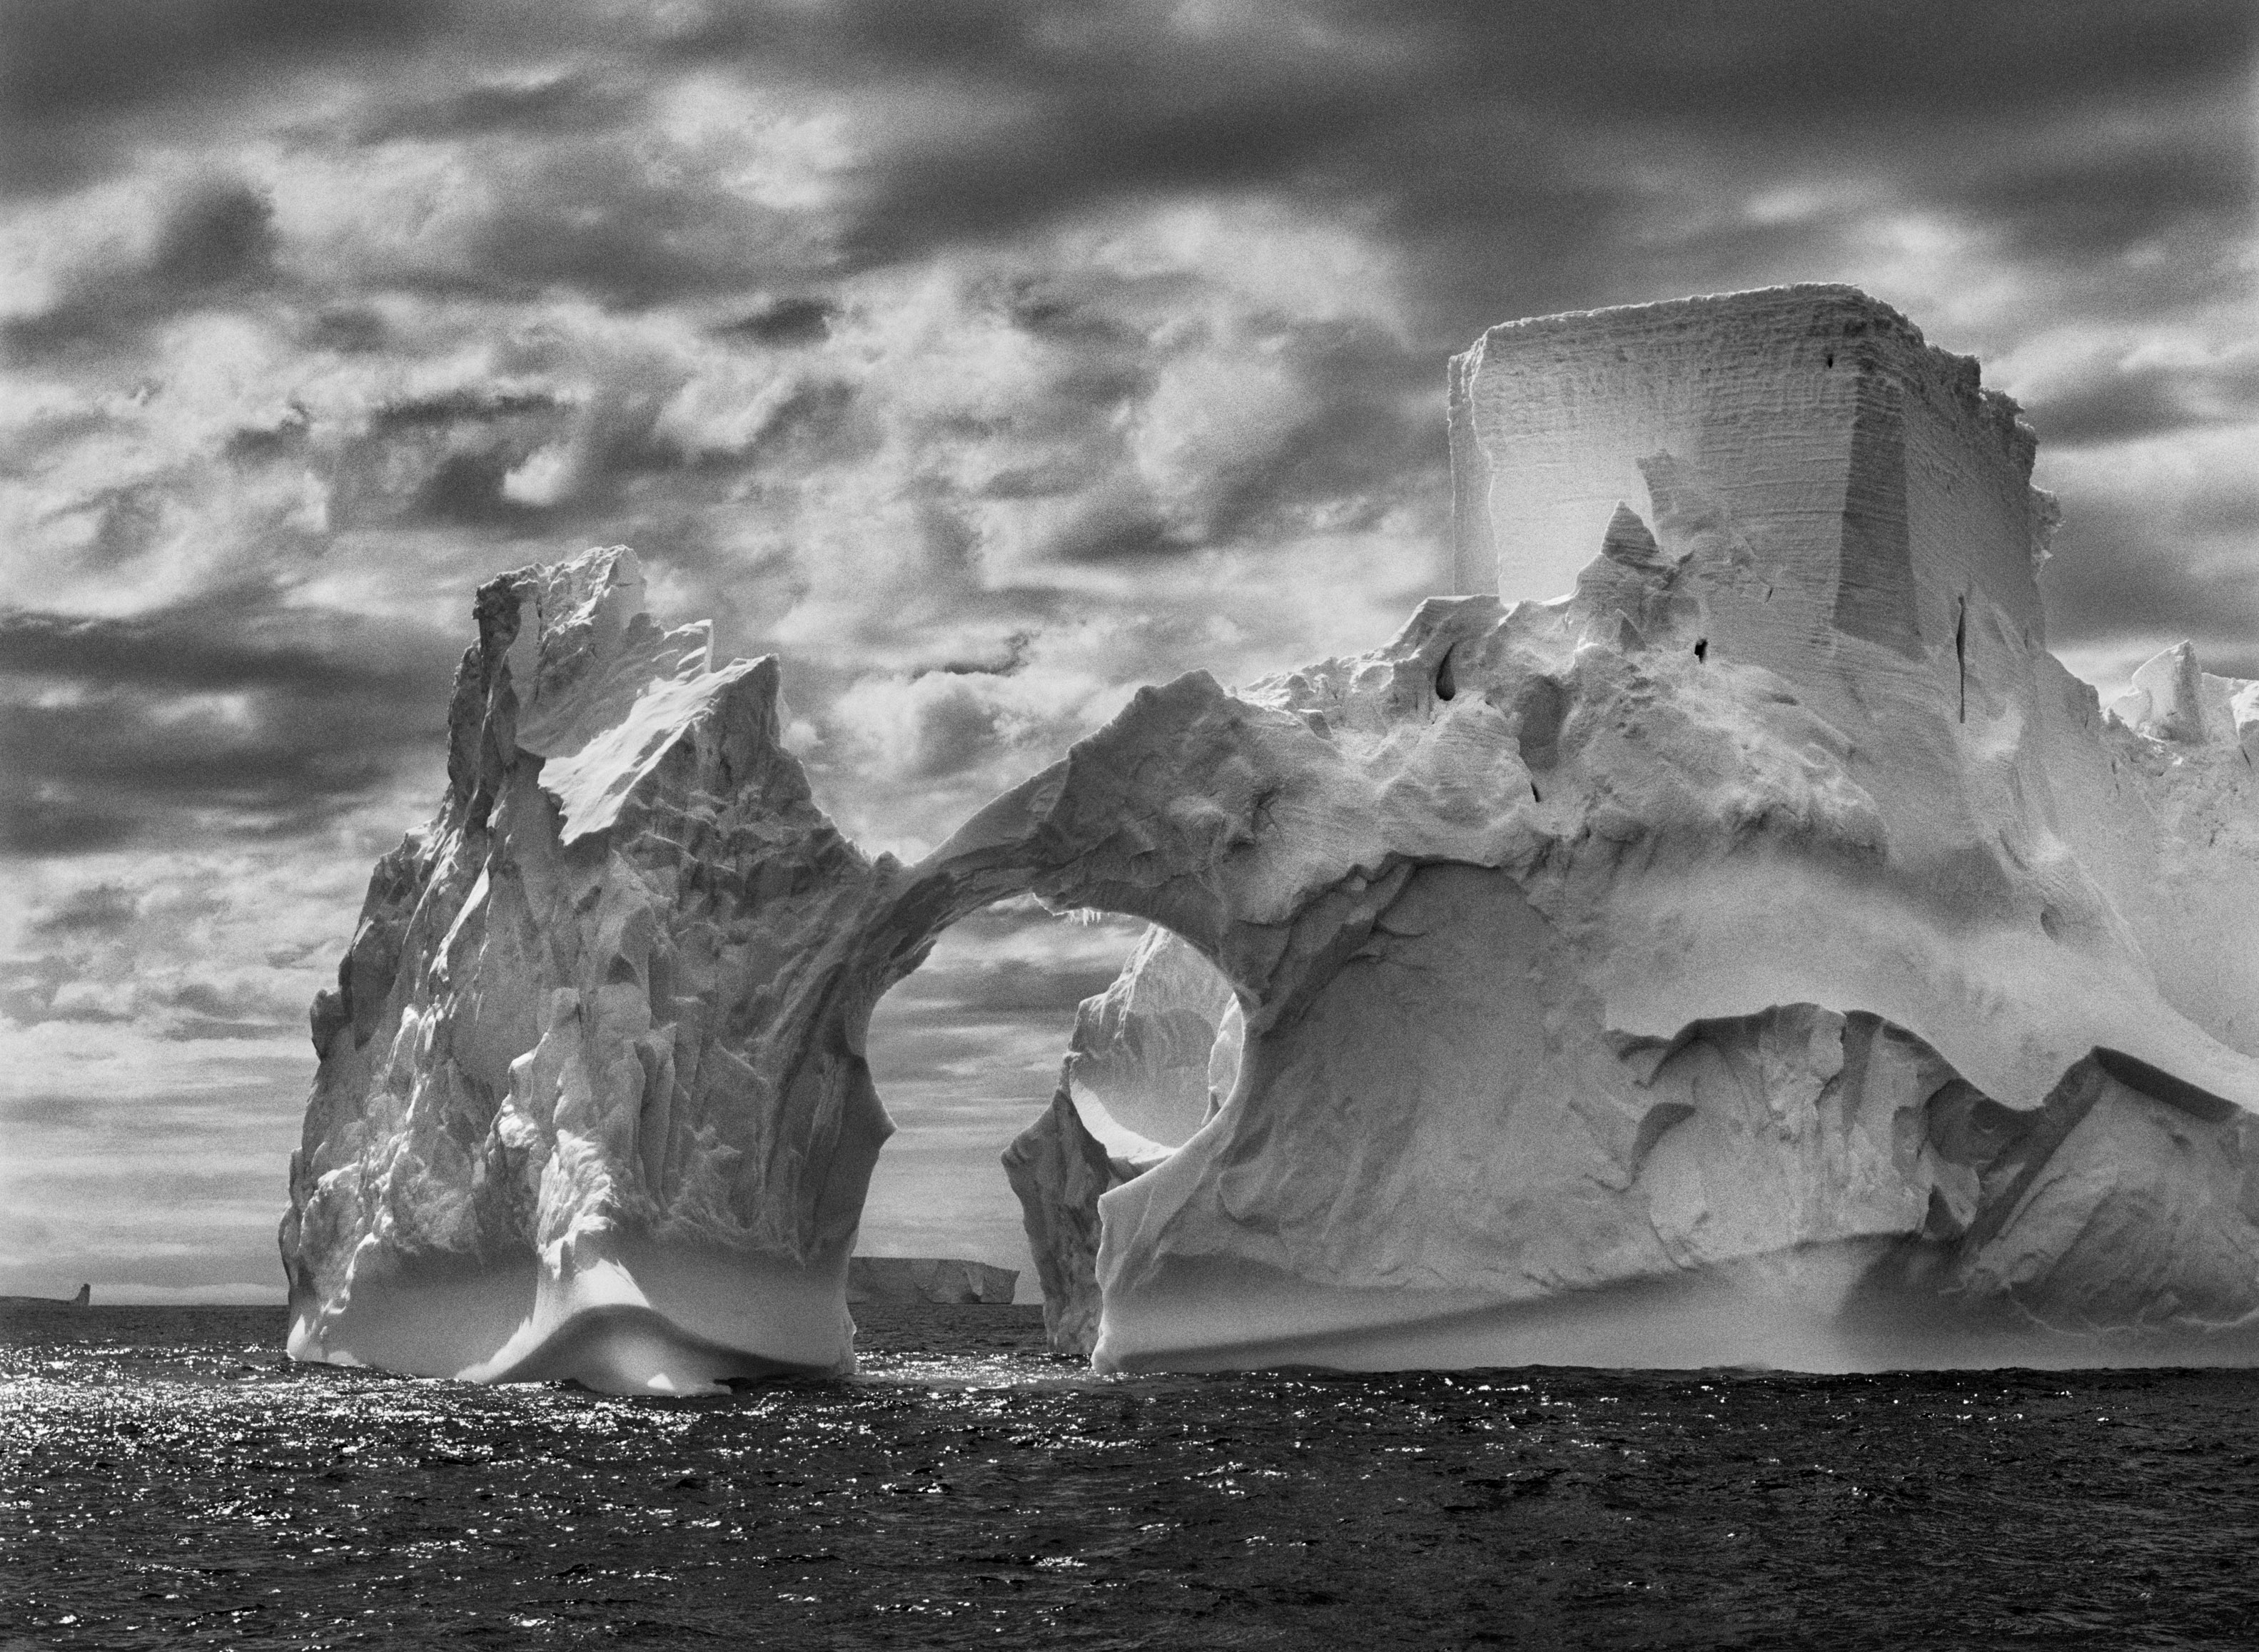 3-penisola-antartica-2005-sebastiao-salgado-amazonas-images